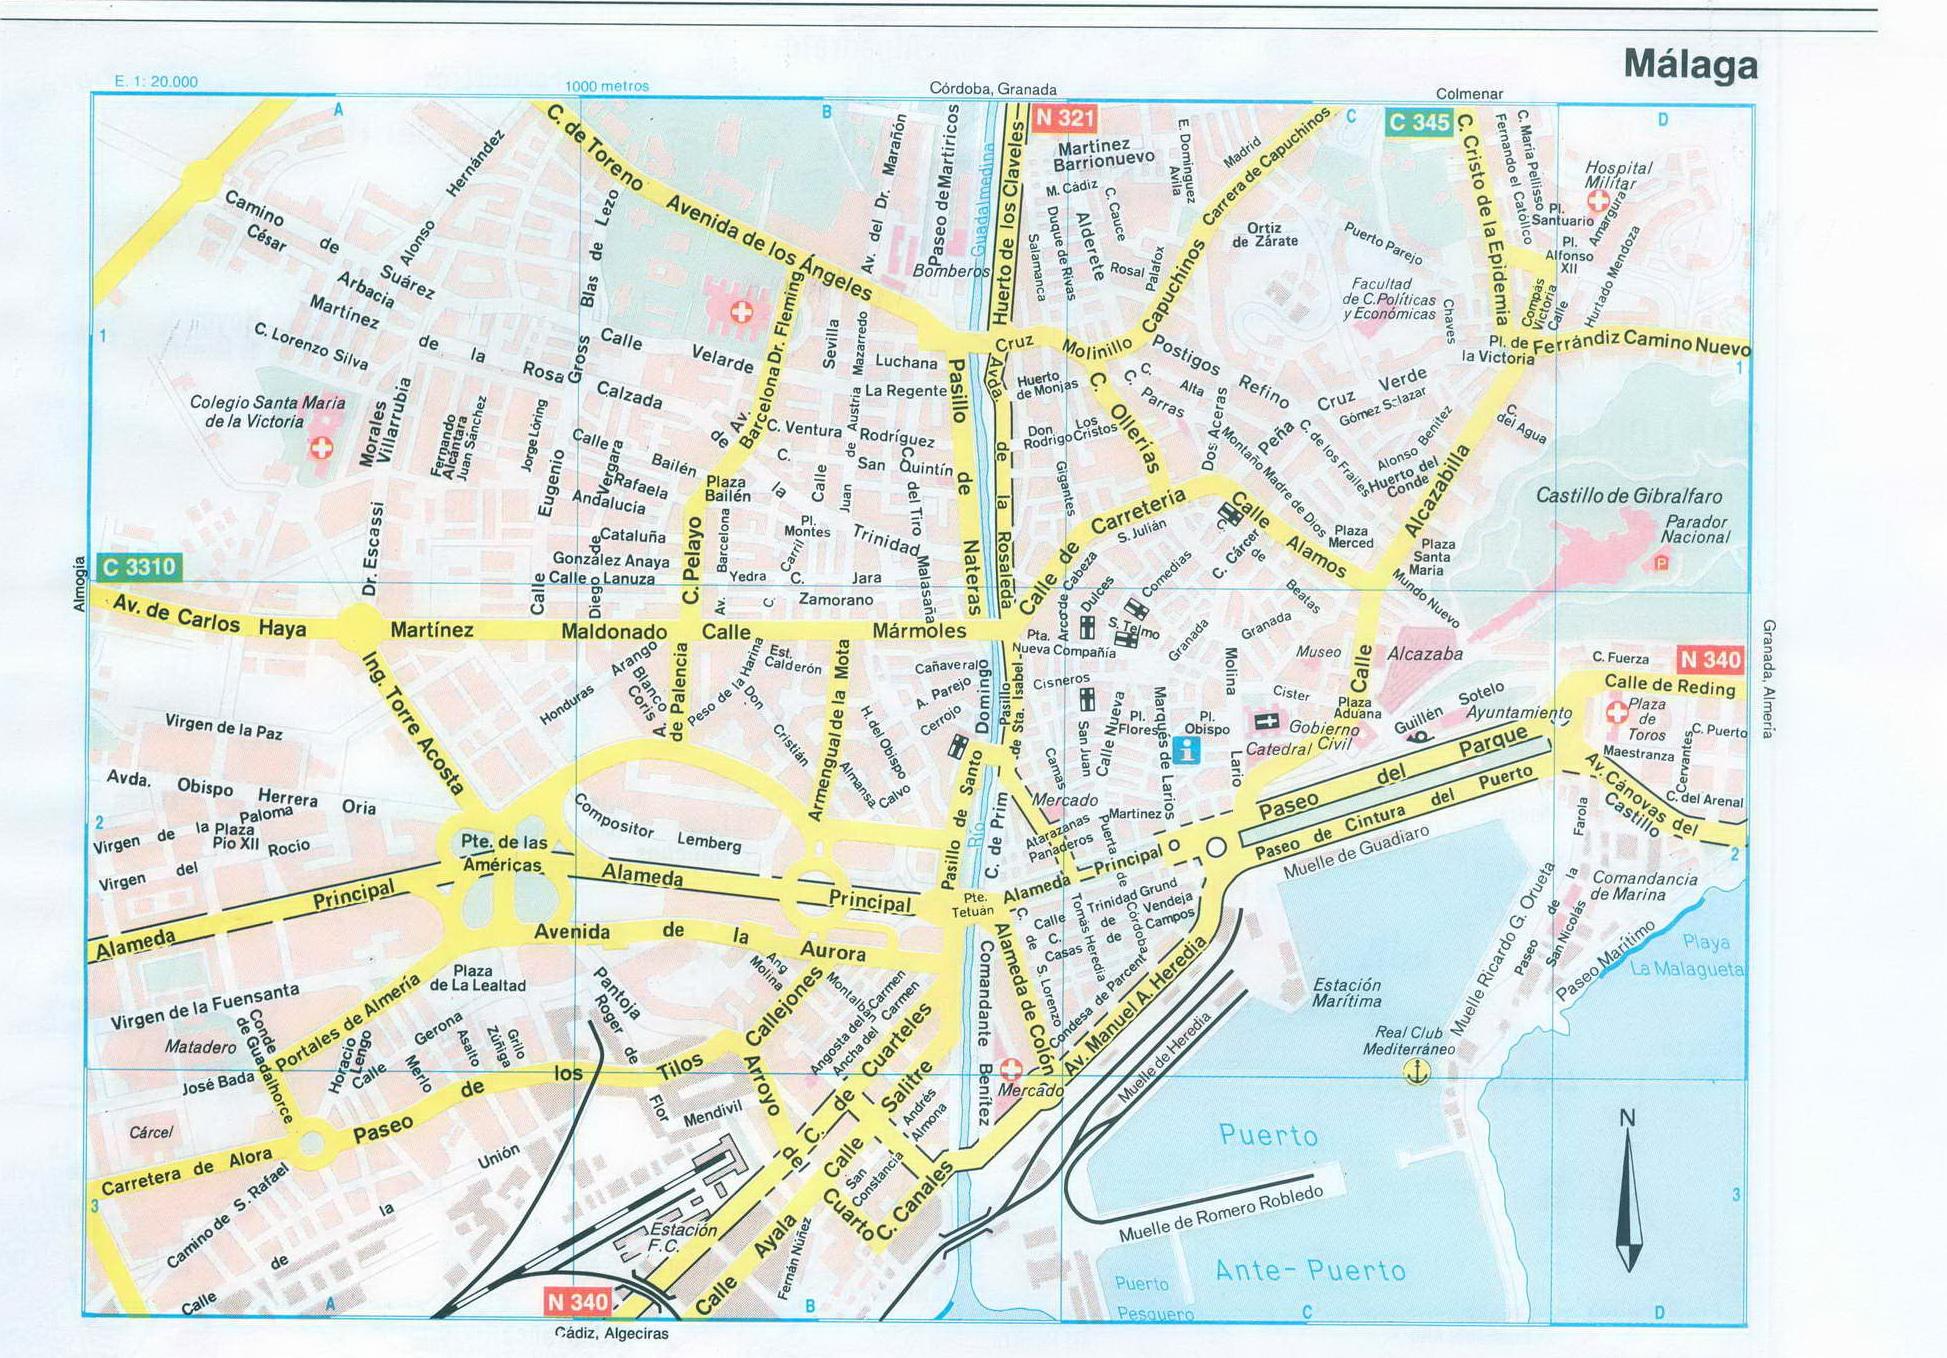 Испания, карта Малаги. Карта улиц города Малага, Испания ...: http://map-auto.ru/map893717_0_0.htm